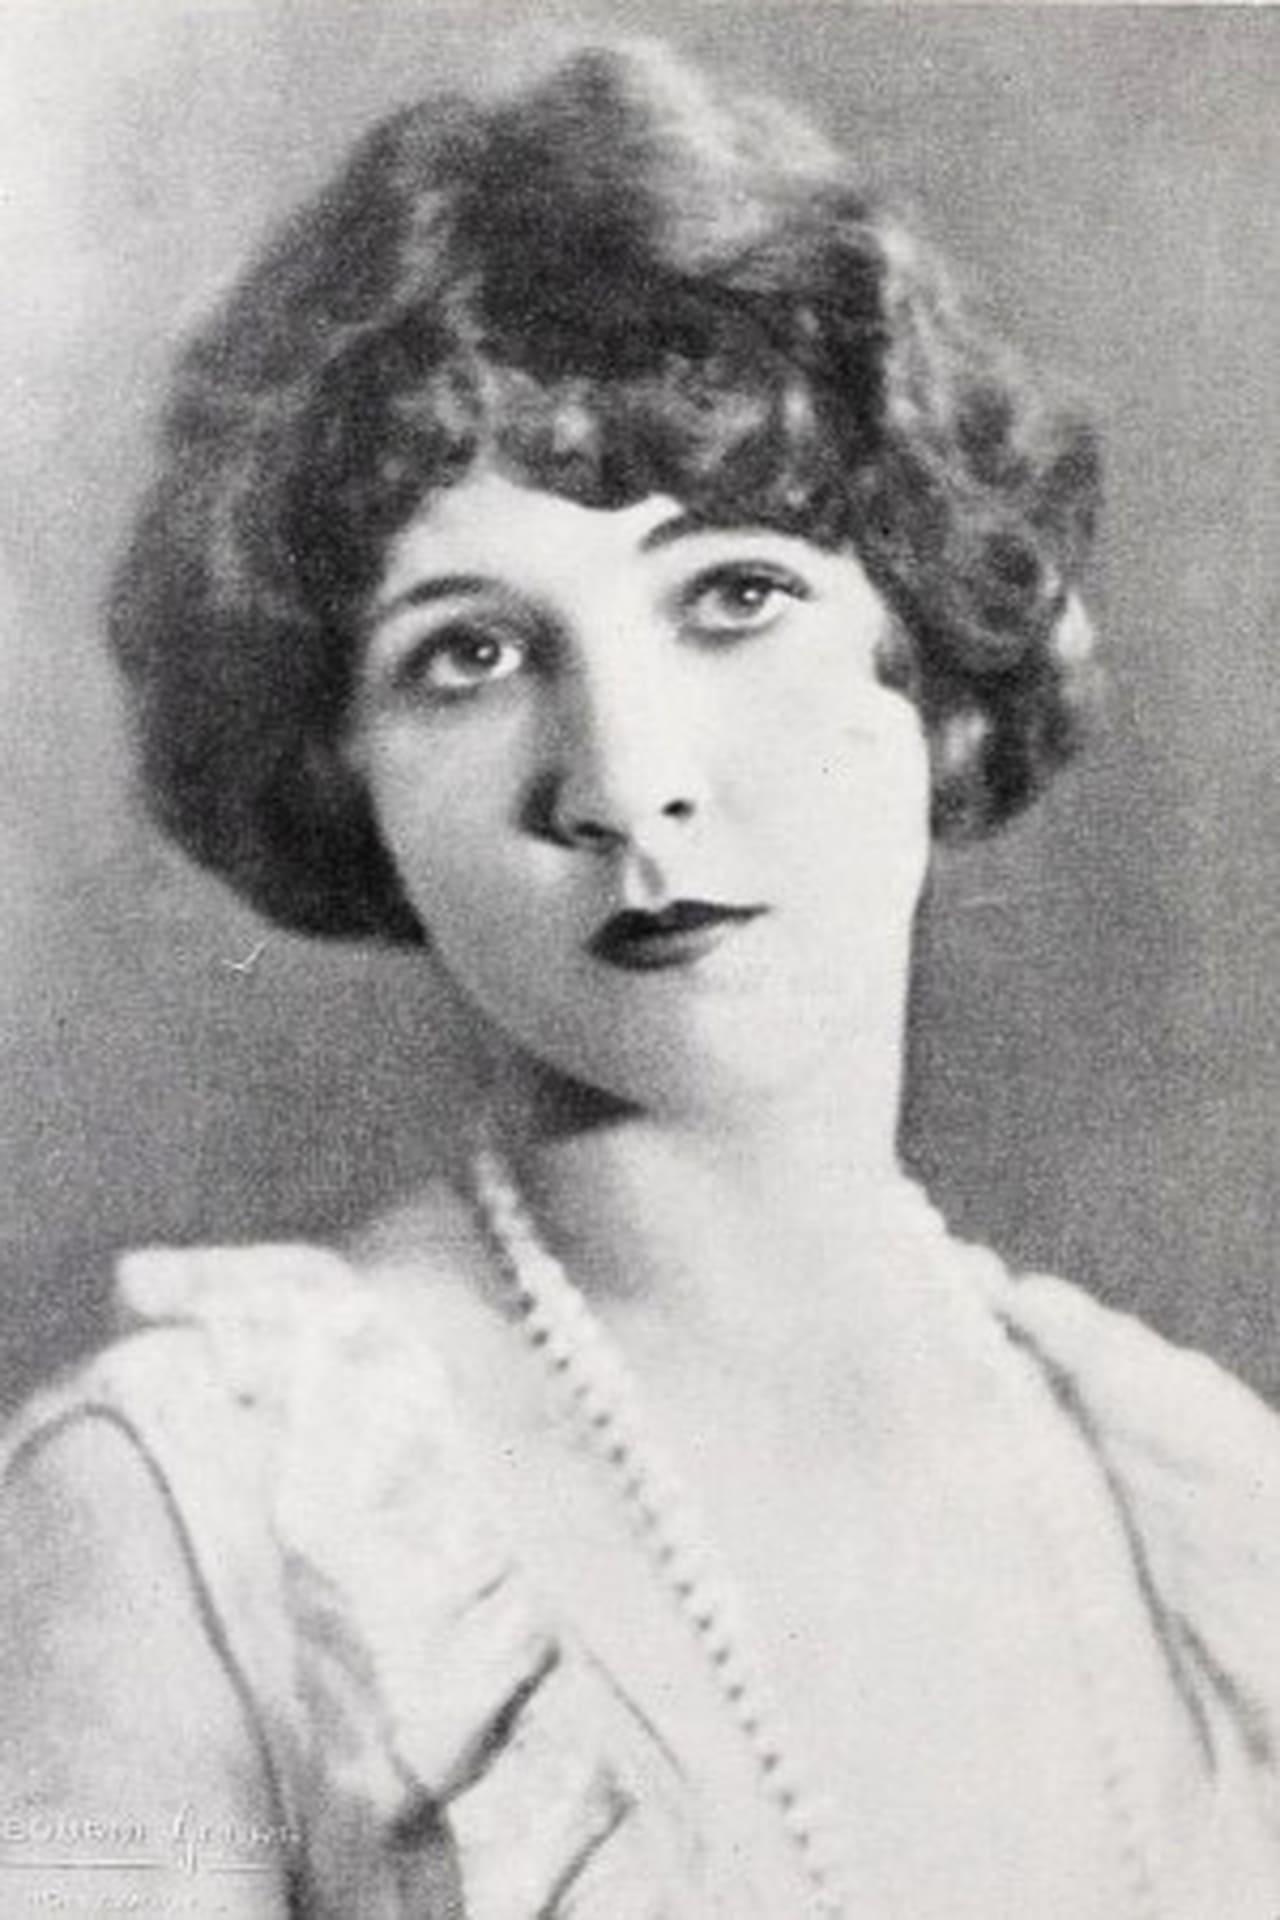 Julanne Johnston